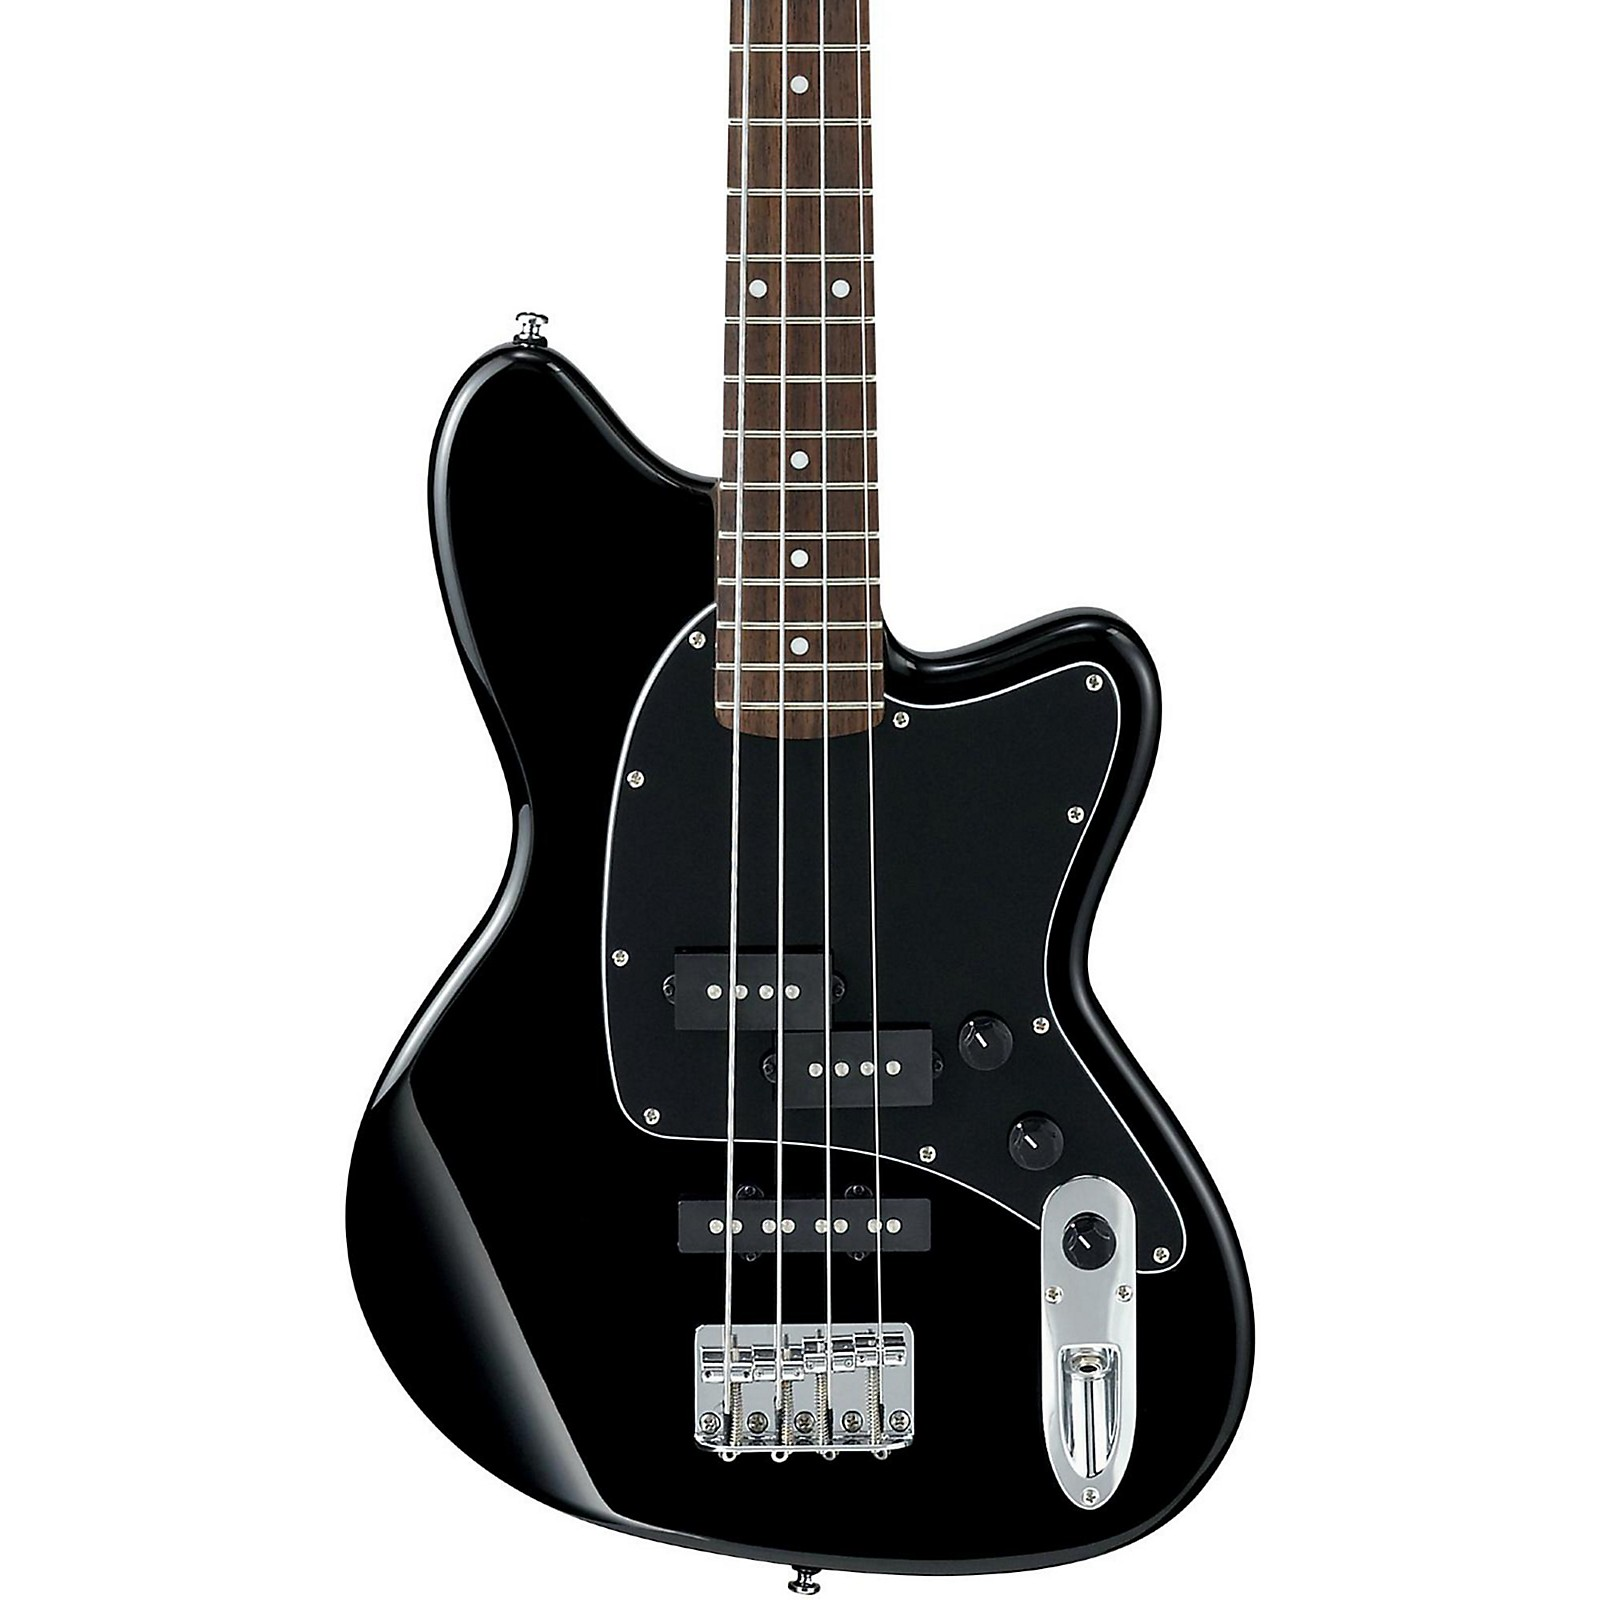 Ibanez TMB30 Bass